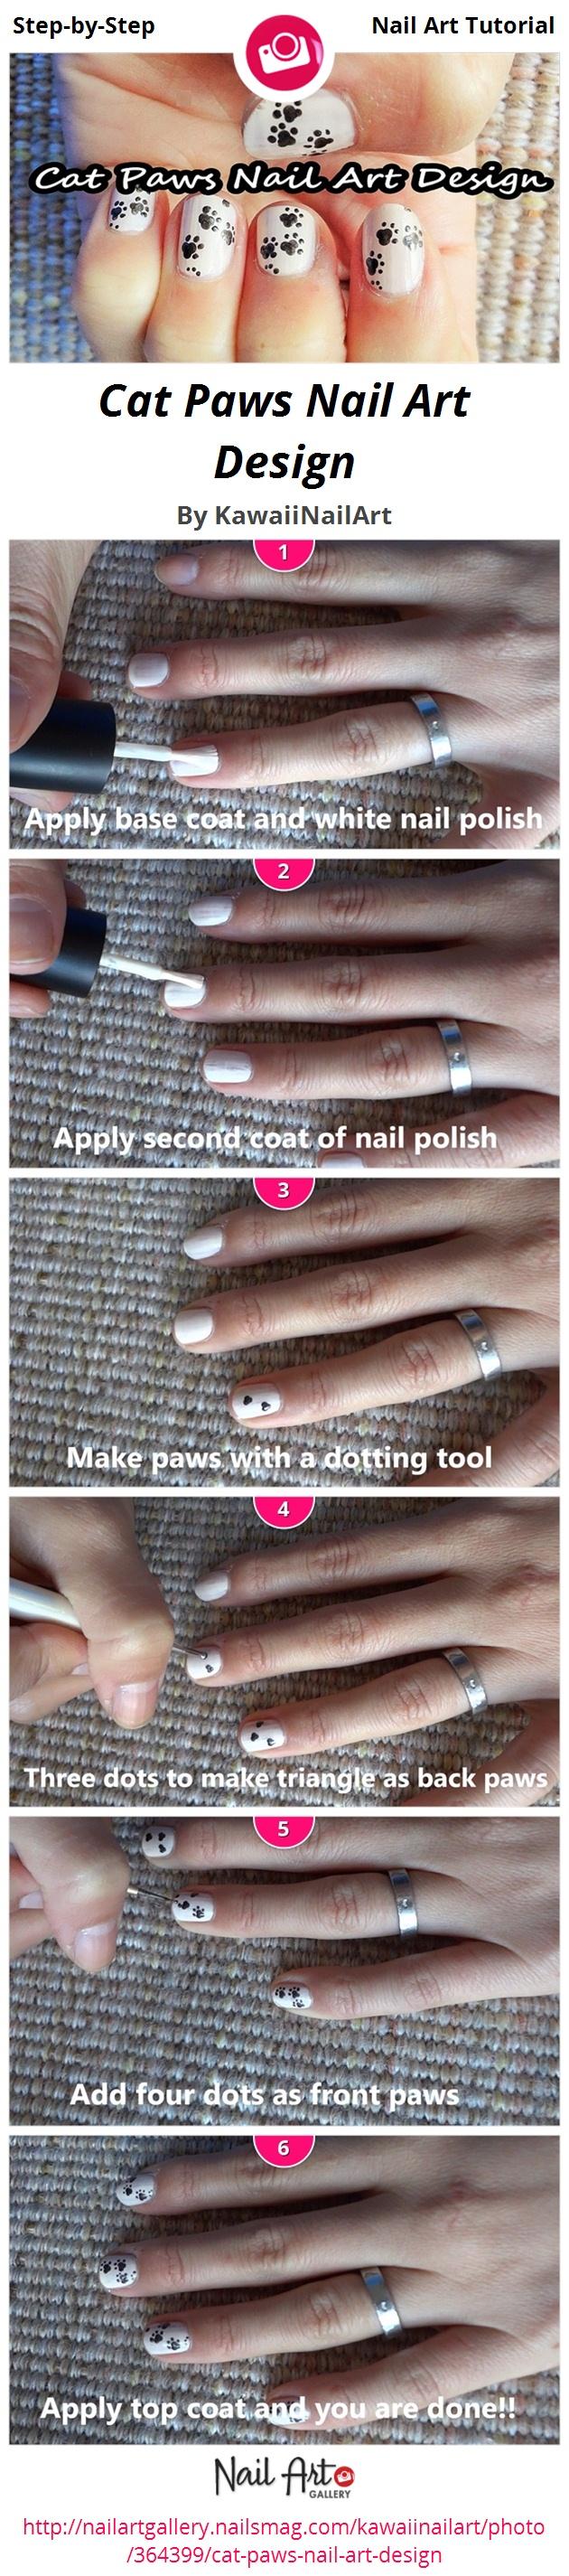 Cat Paws Nail Art Design - Nail Art Gallery